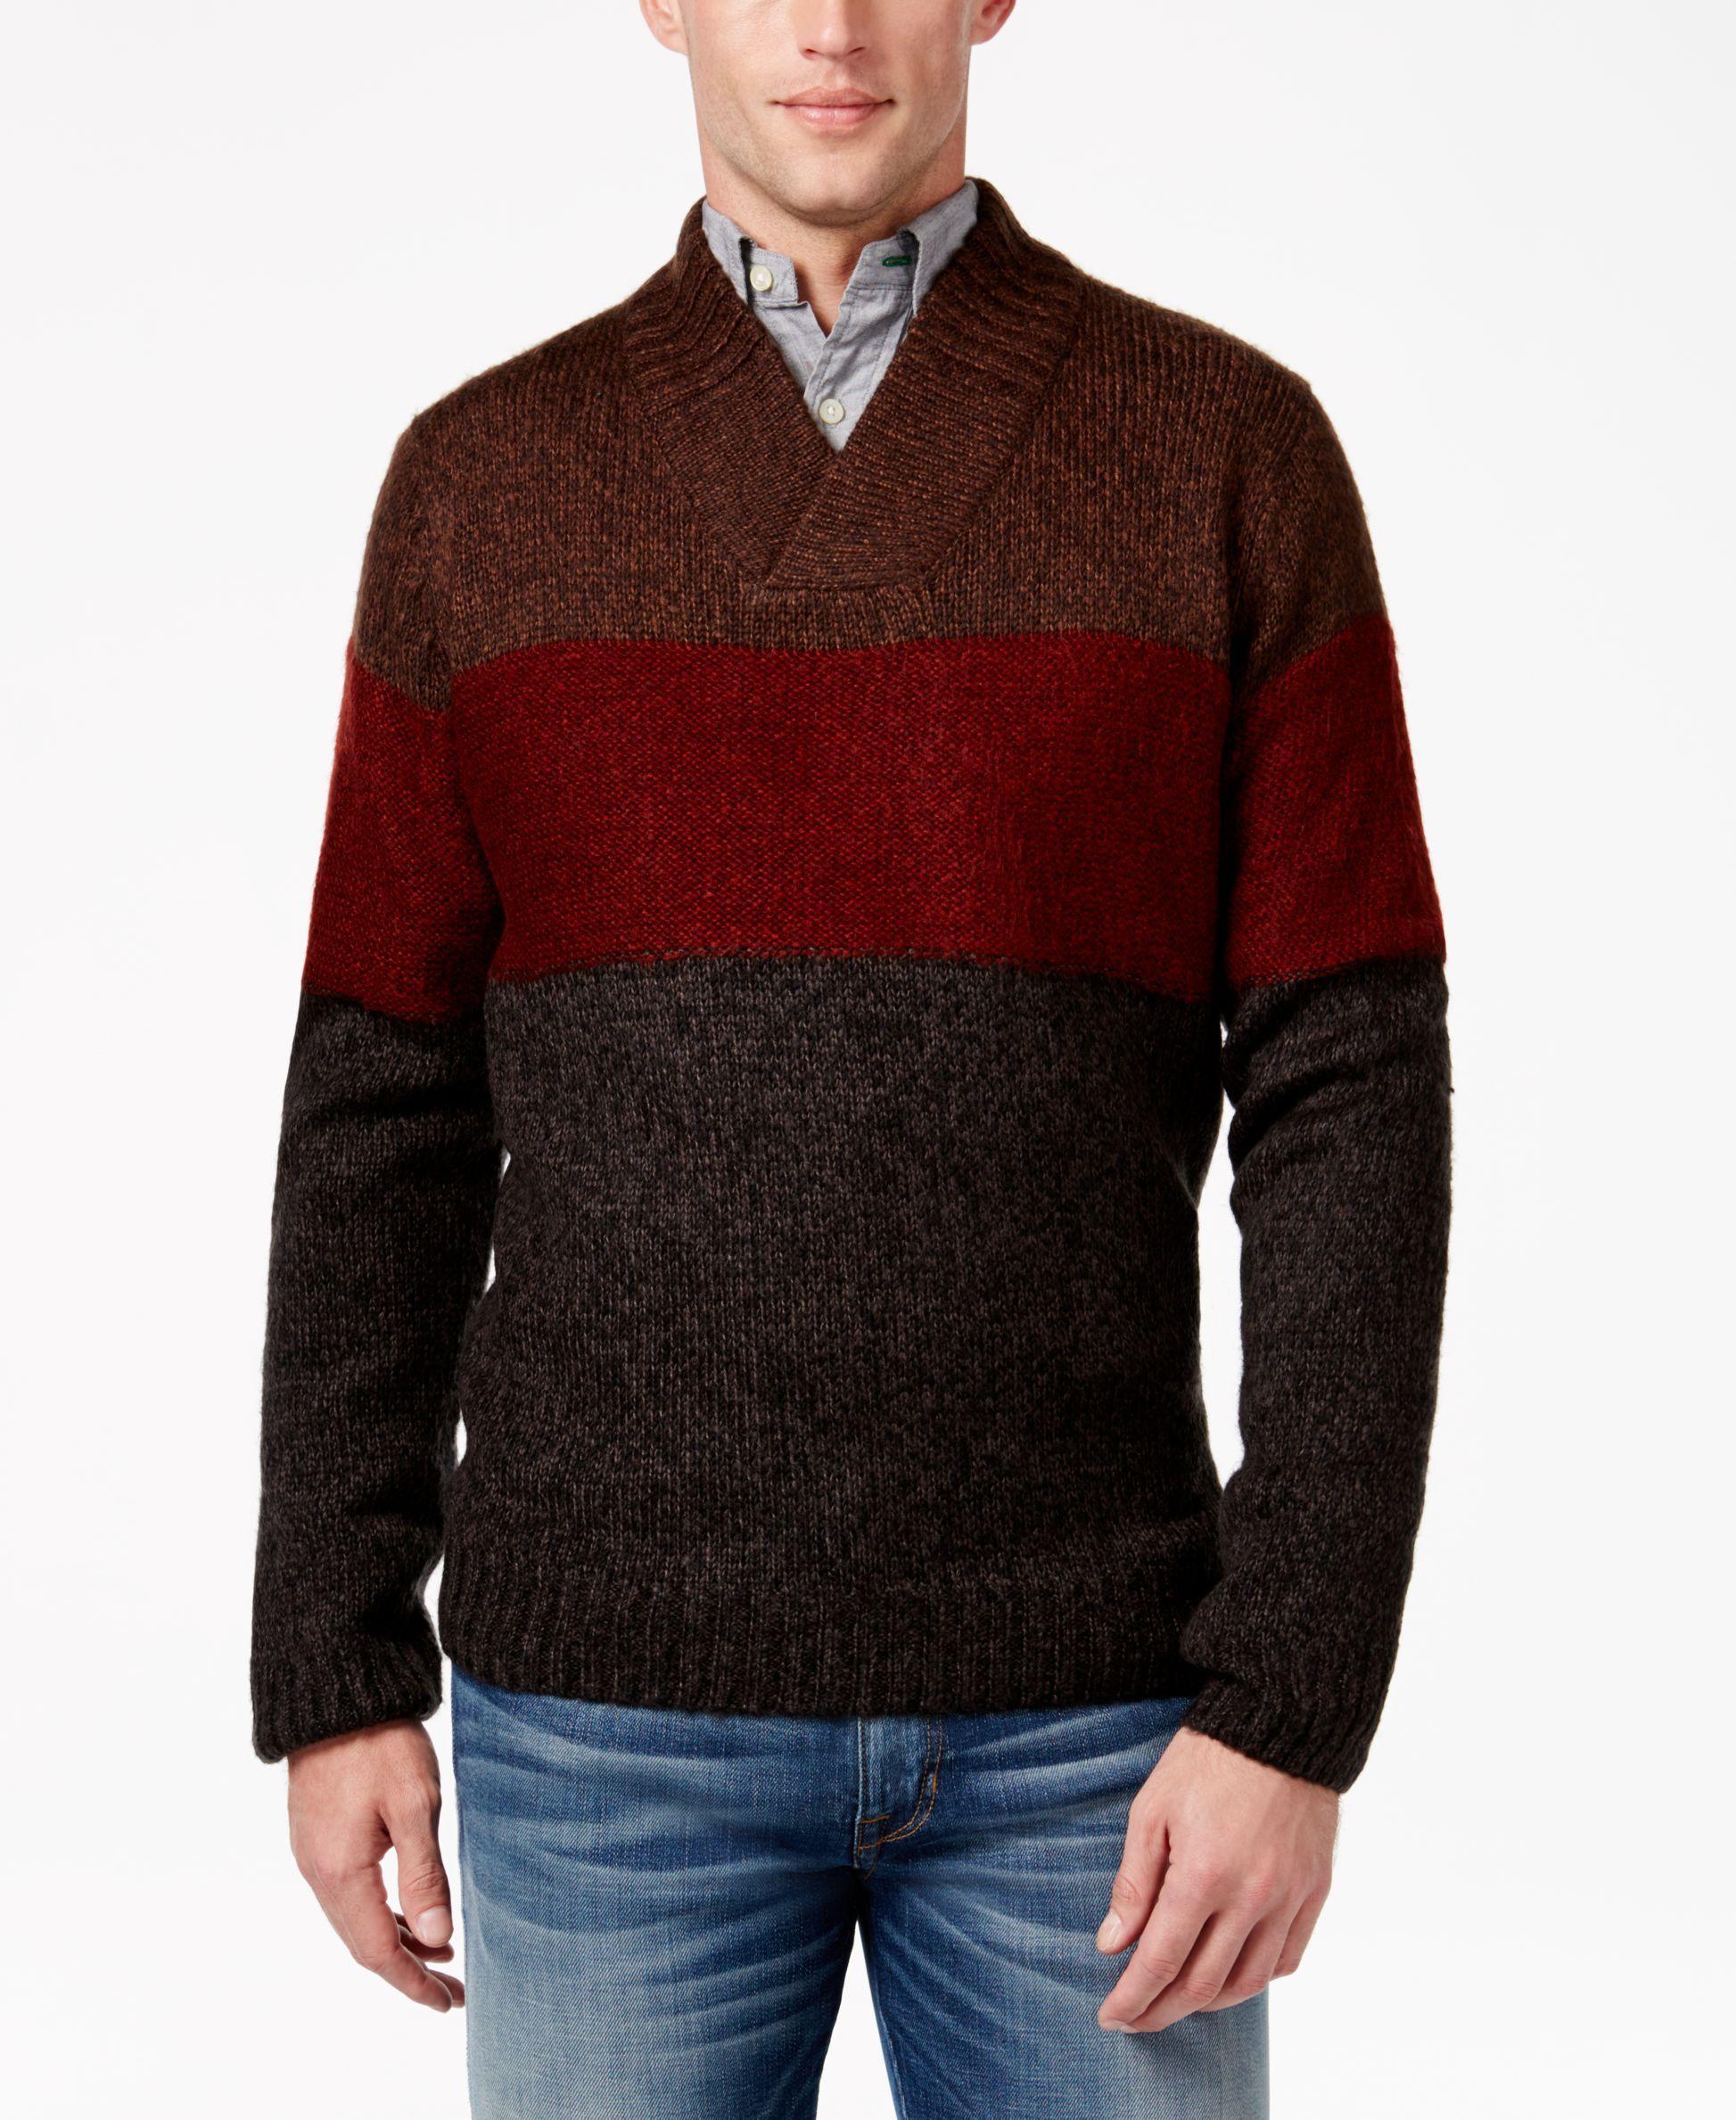 Tricots St Raphael Men's Colorblocked Shawl-Collar Sweater